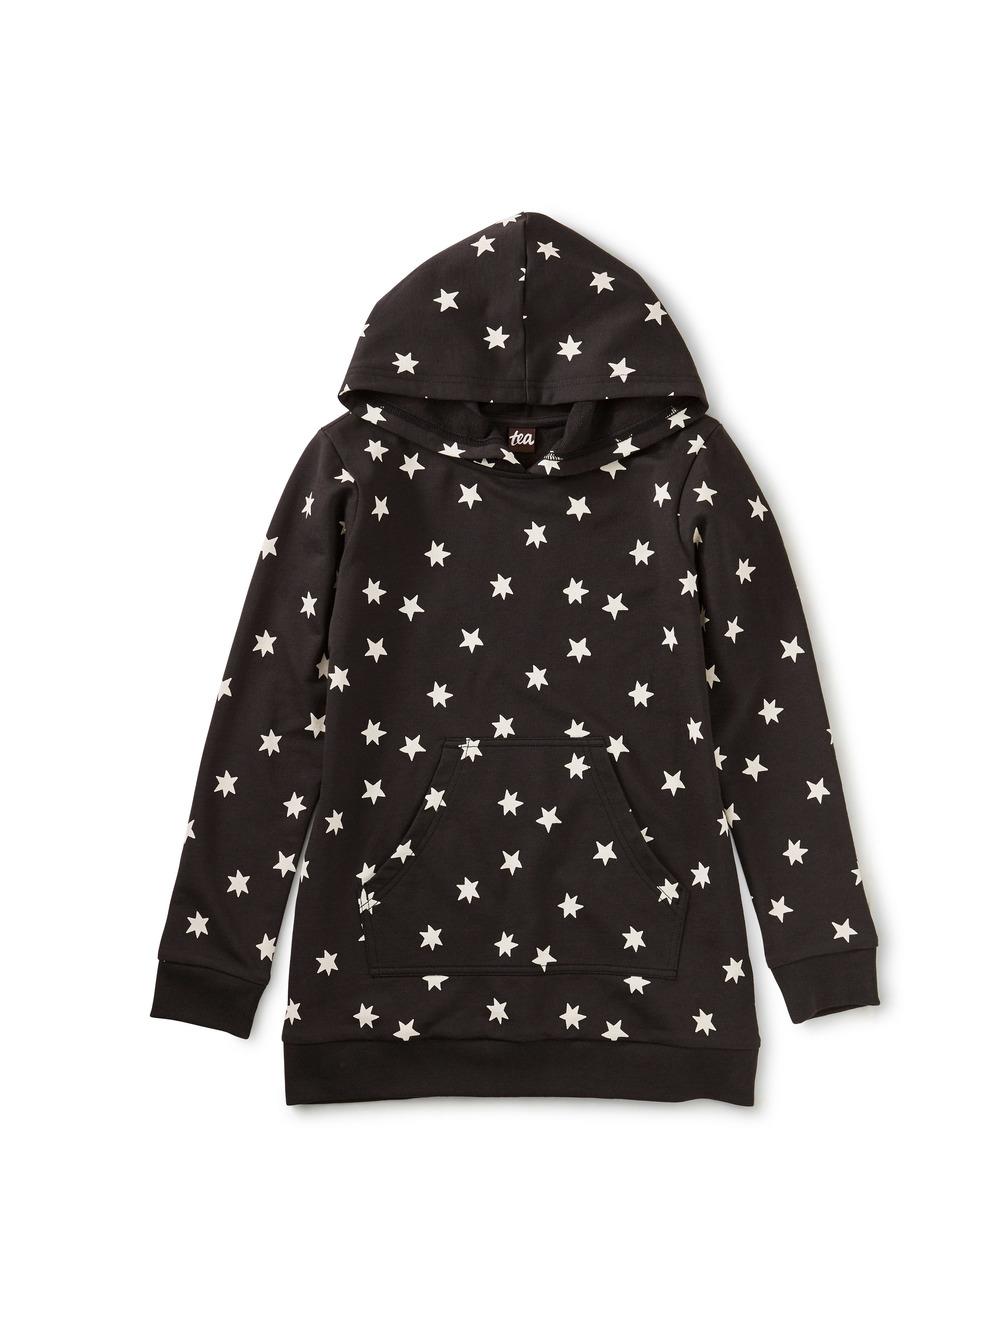 Star Hooded Tunic